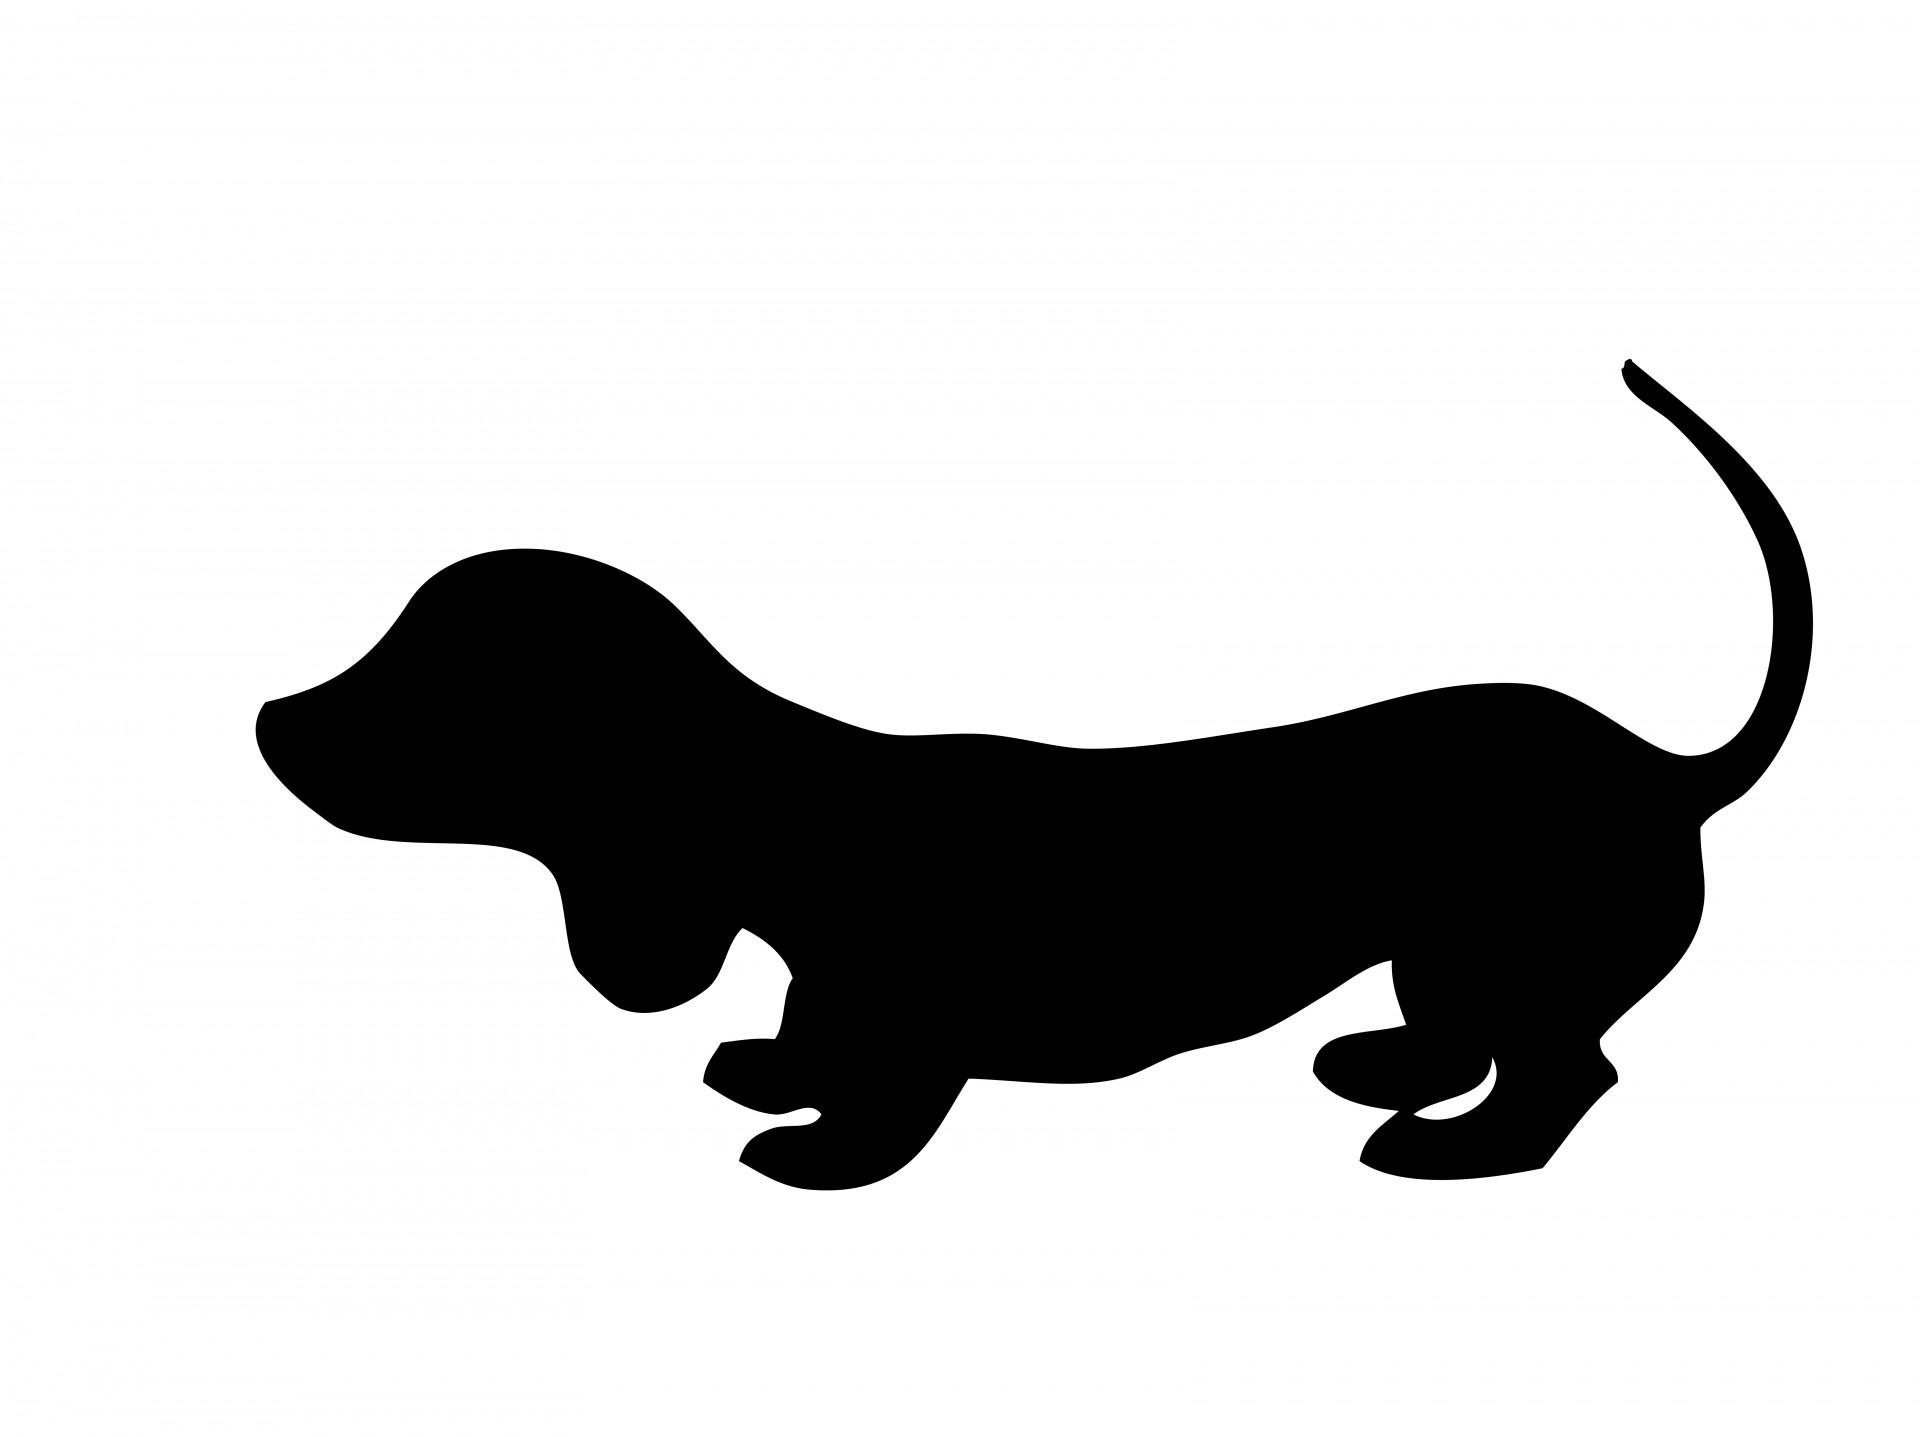 1920x1437 Dog Silhouette Free Stock Photo